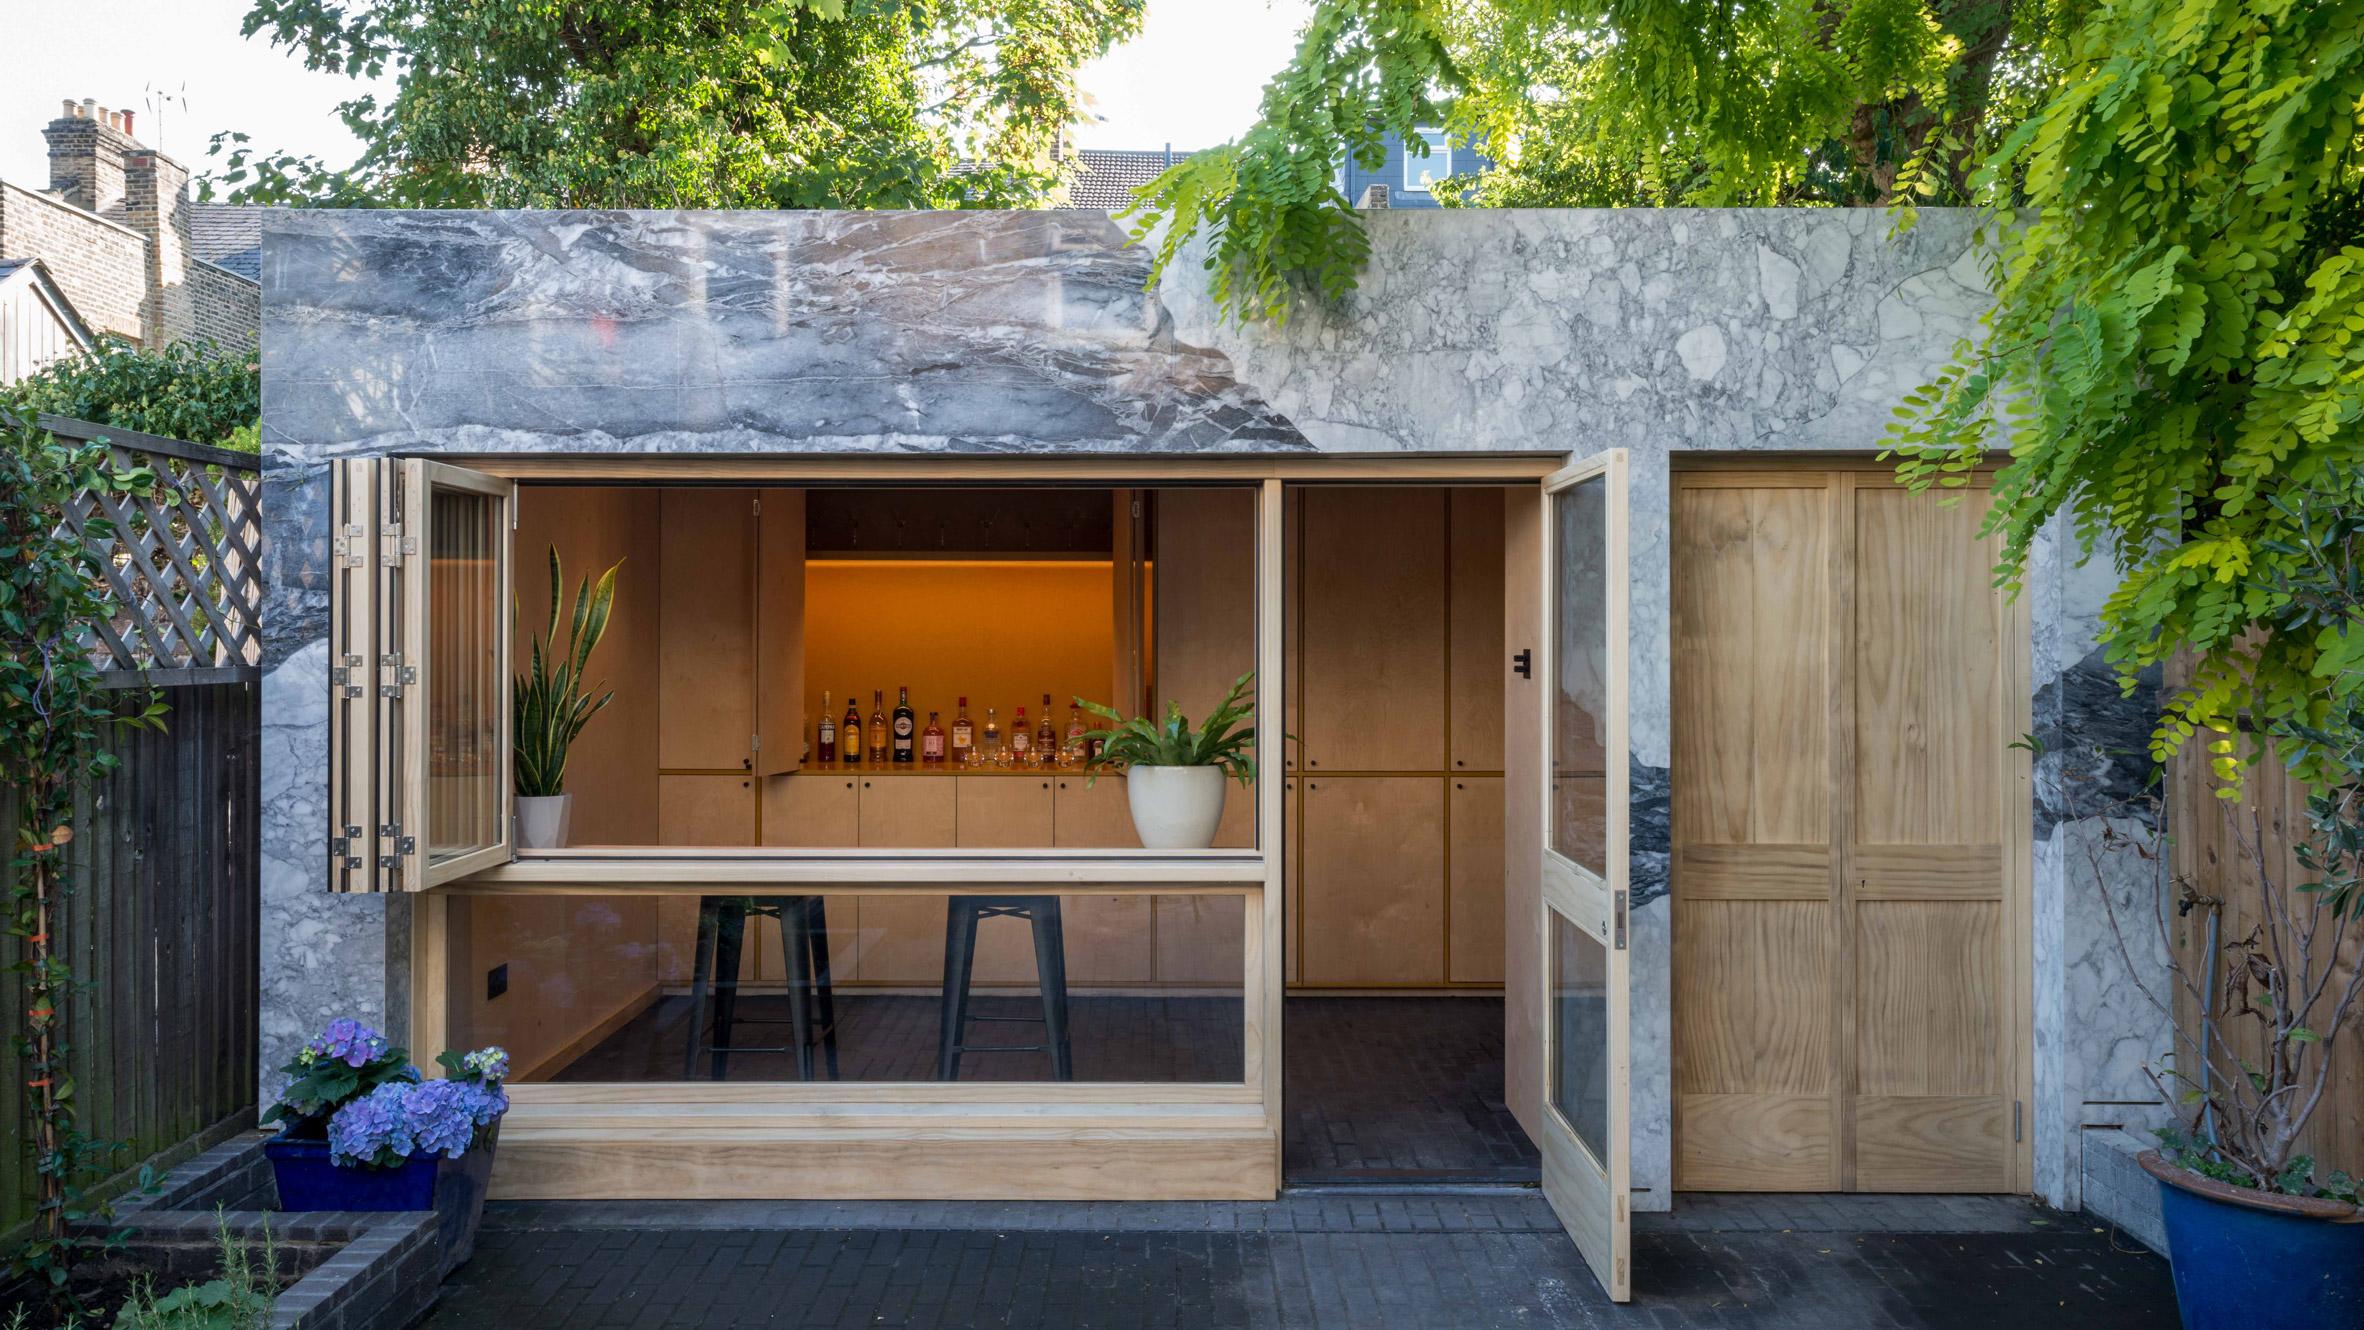 A marble-clad garden room